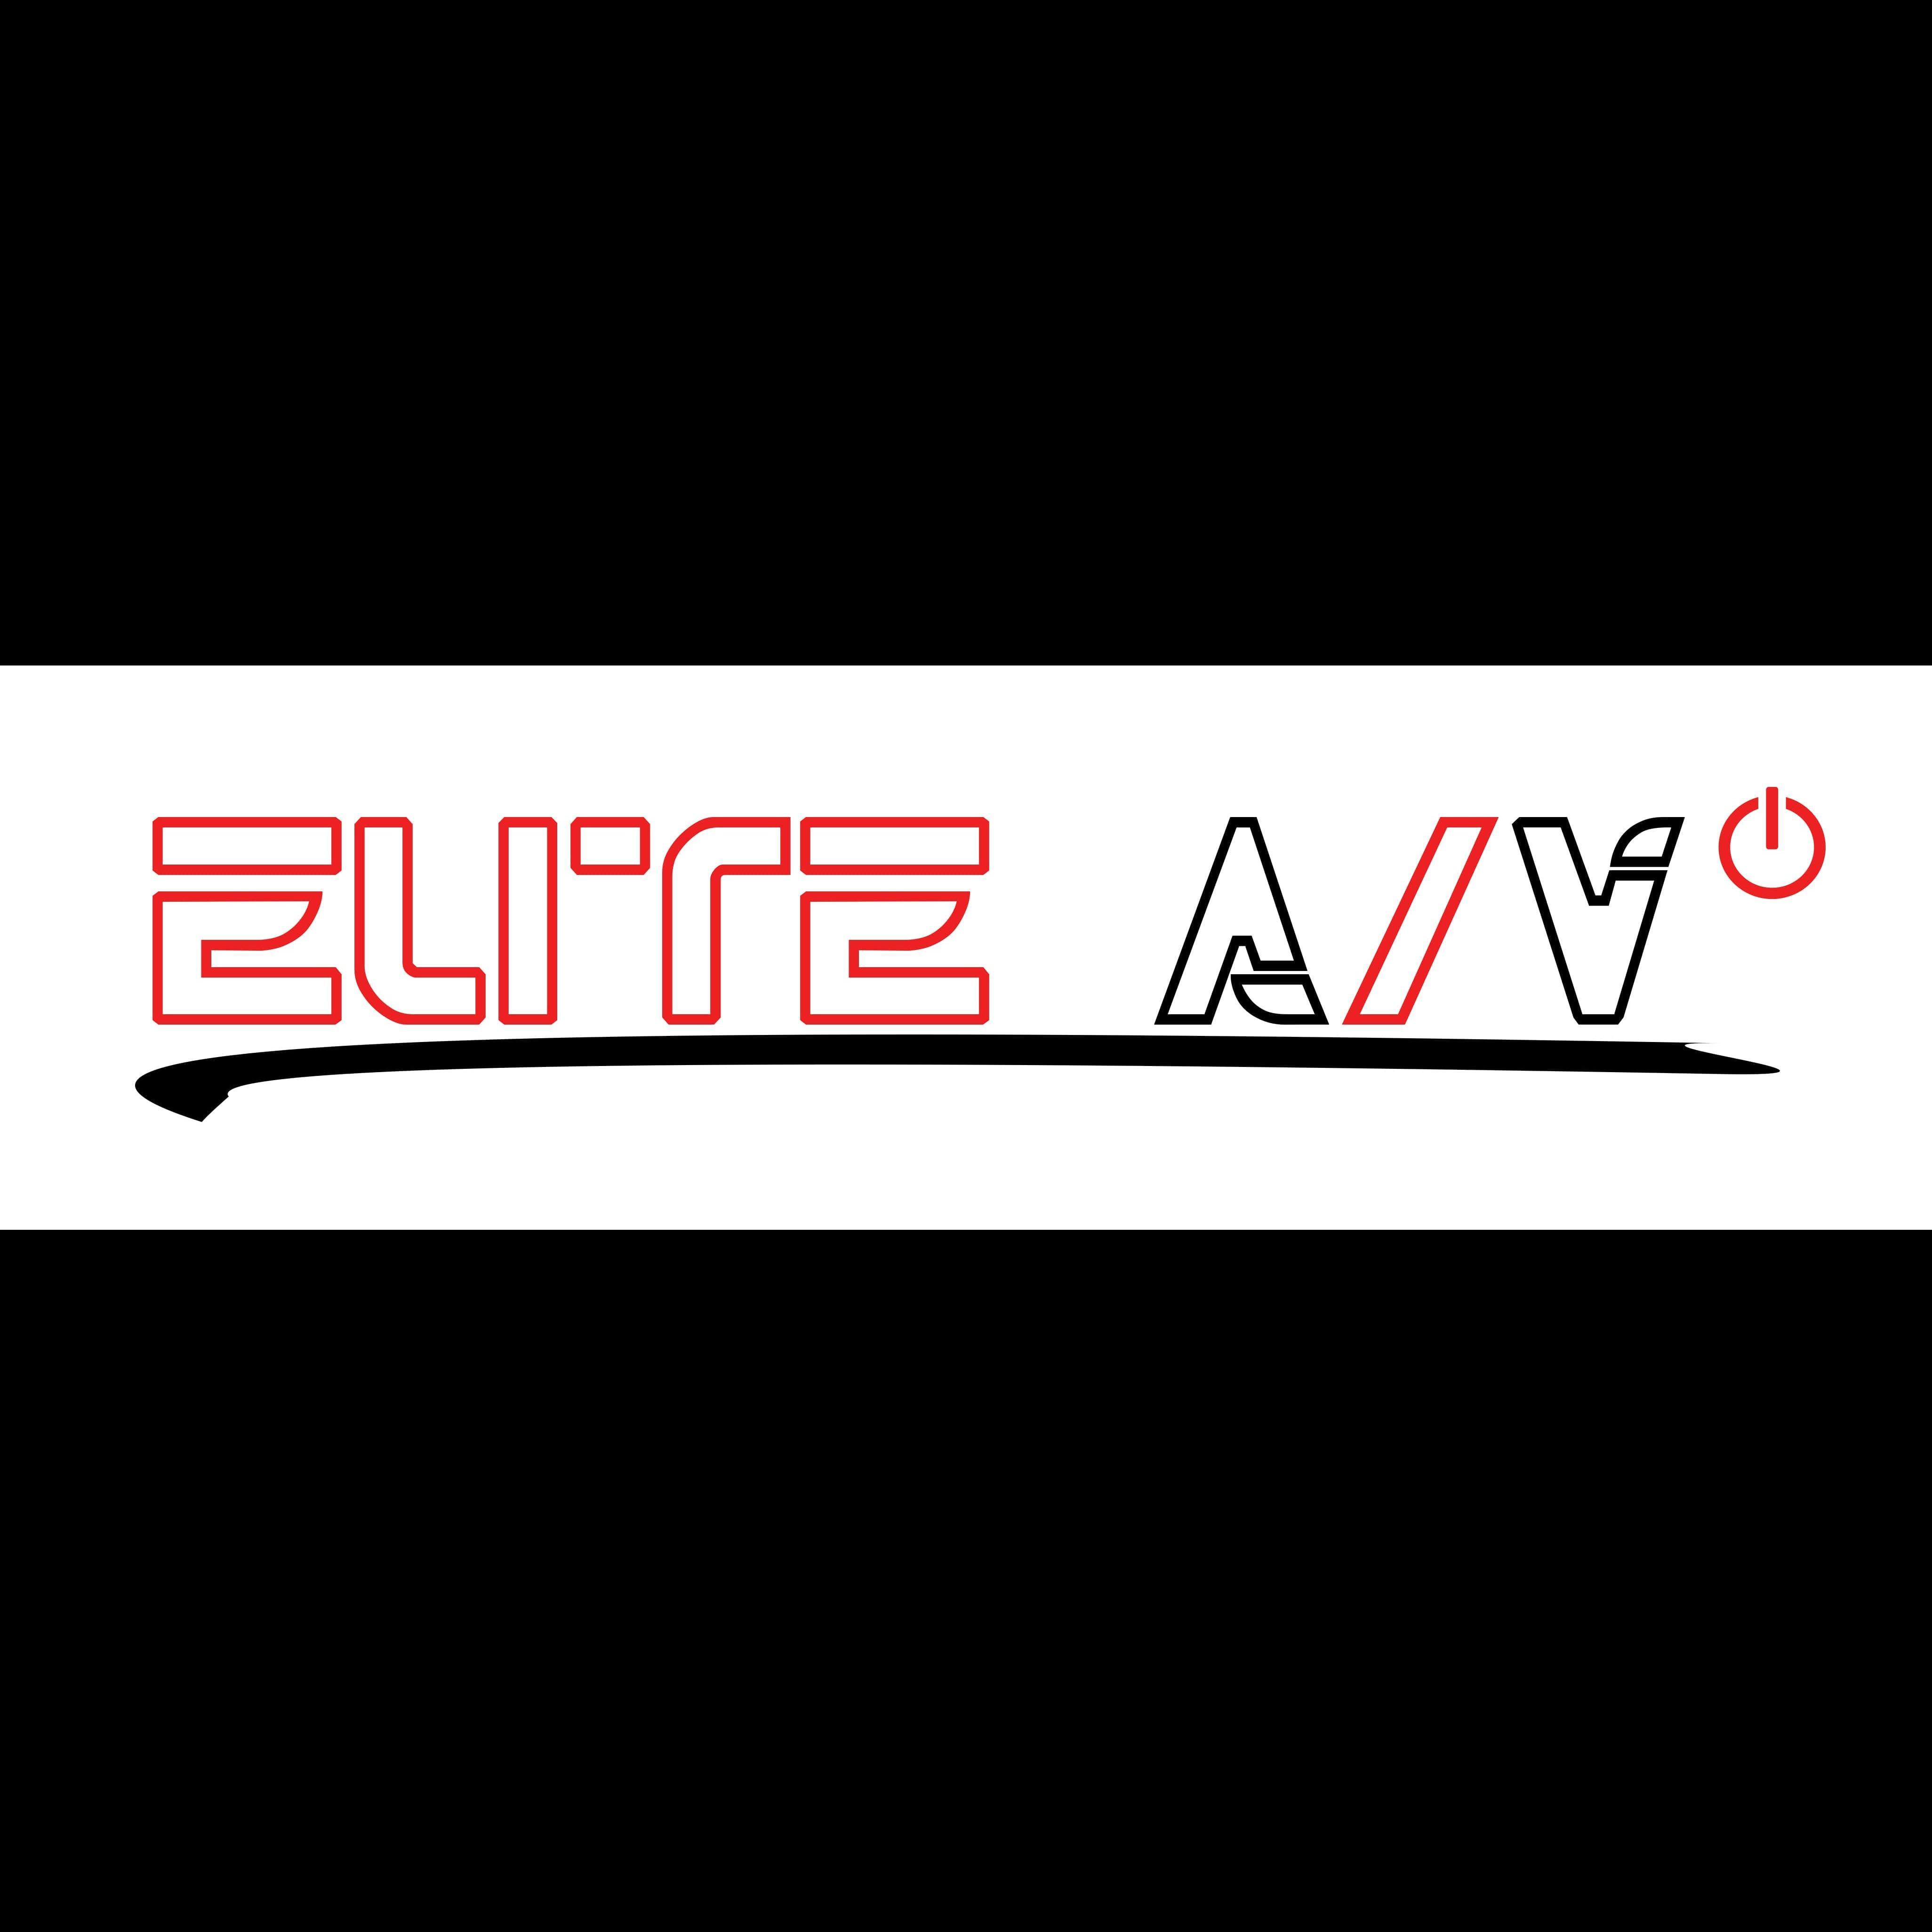 Elite A/V